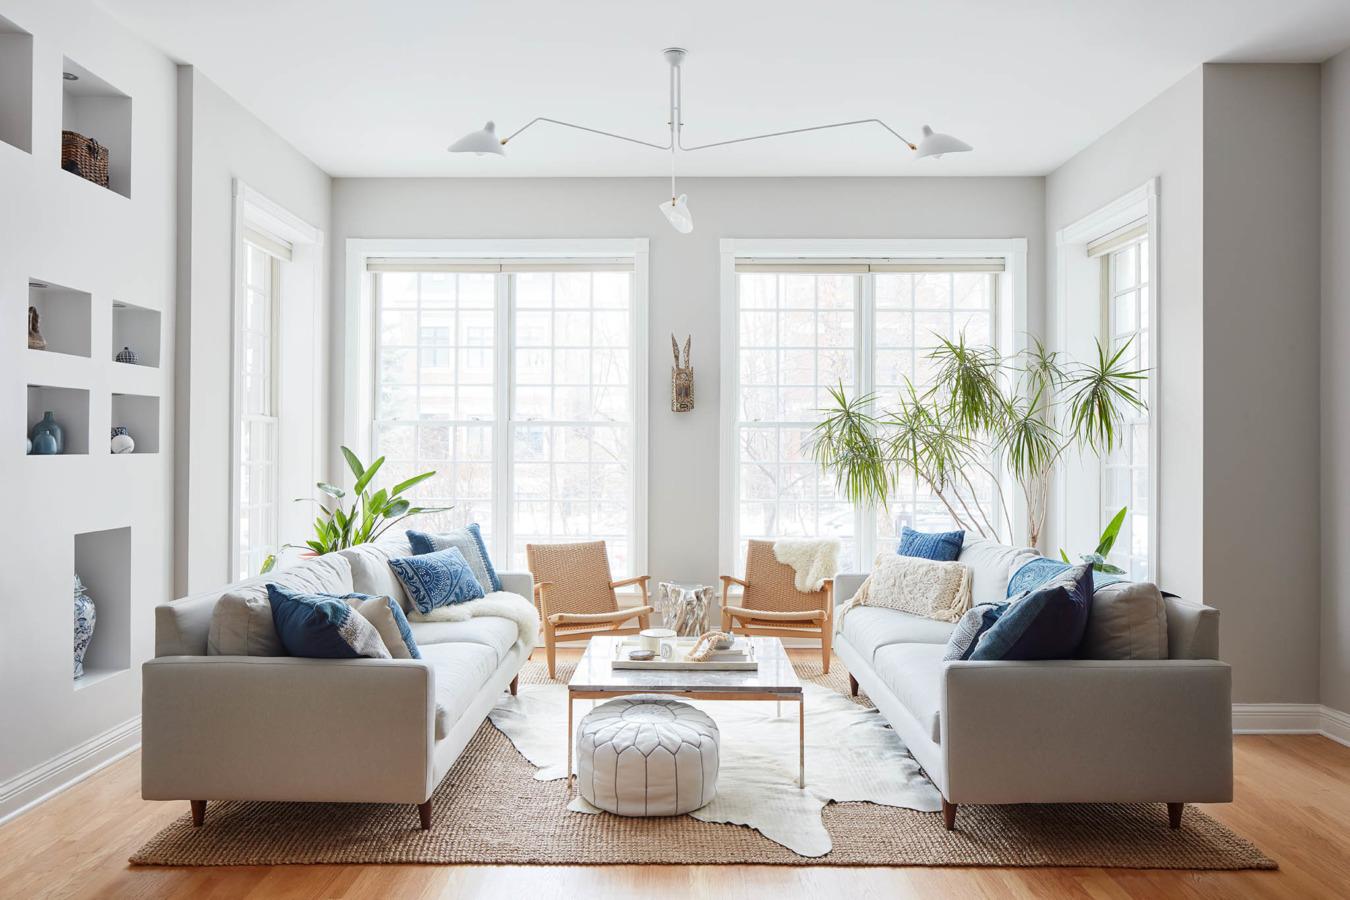 Copy Cat Chic Room Redo | Modern Bohemian Living Room ... on Modern Boho Room  id=28424